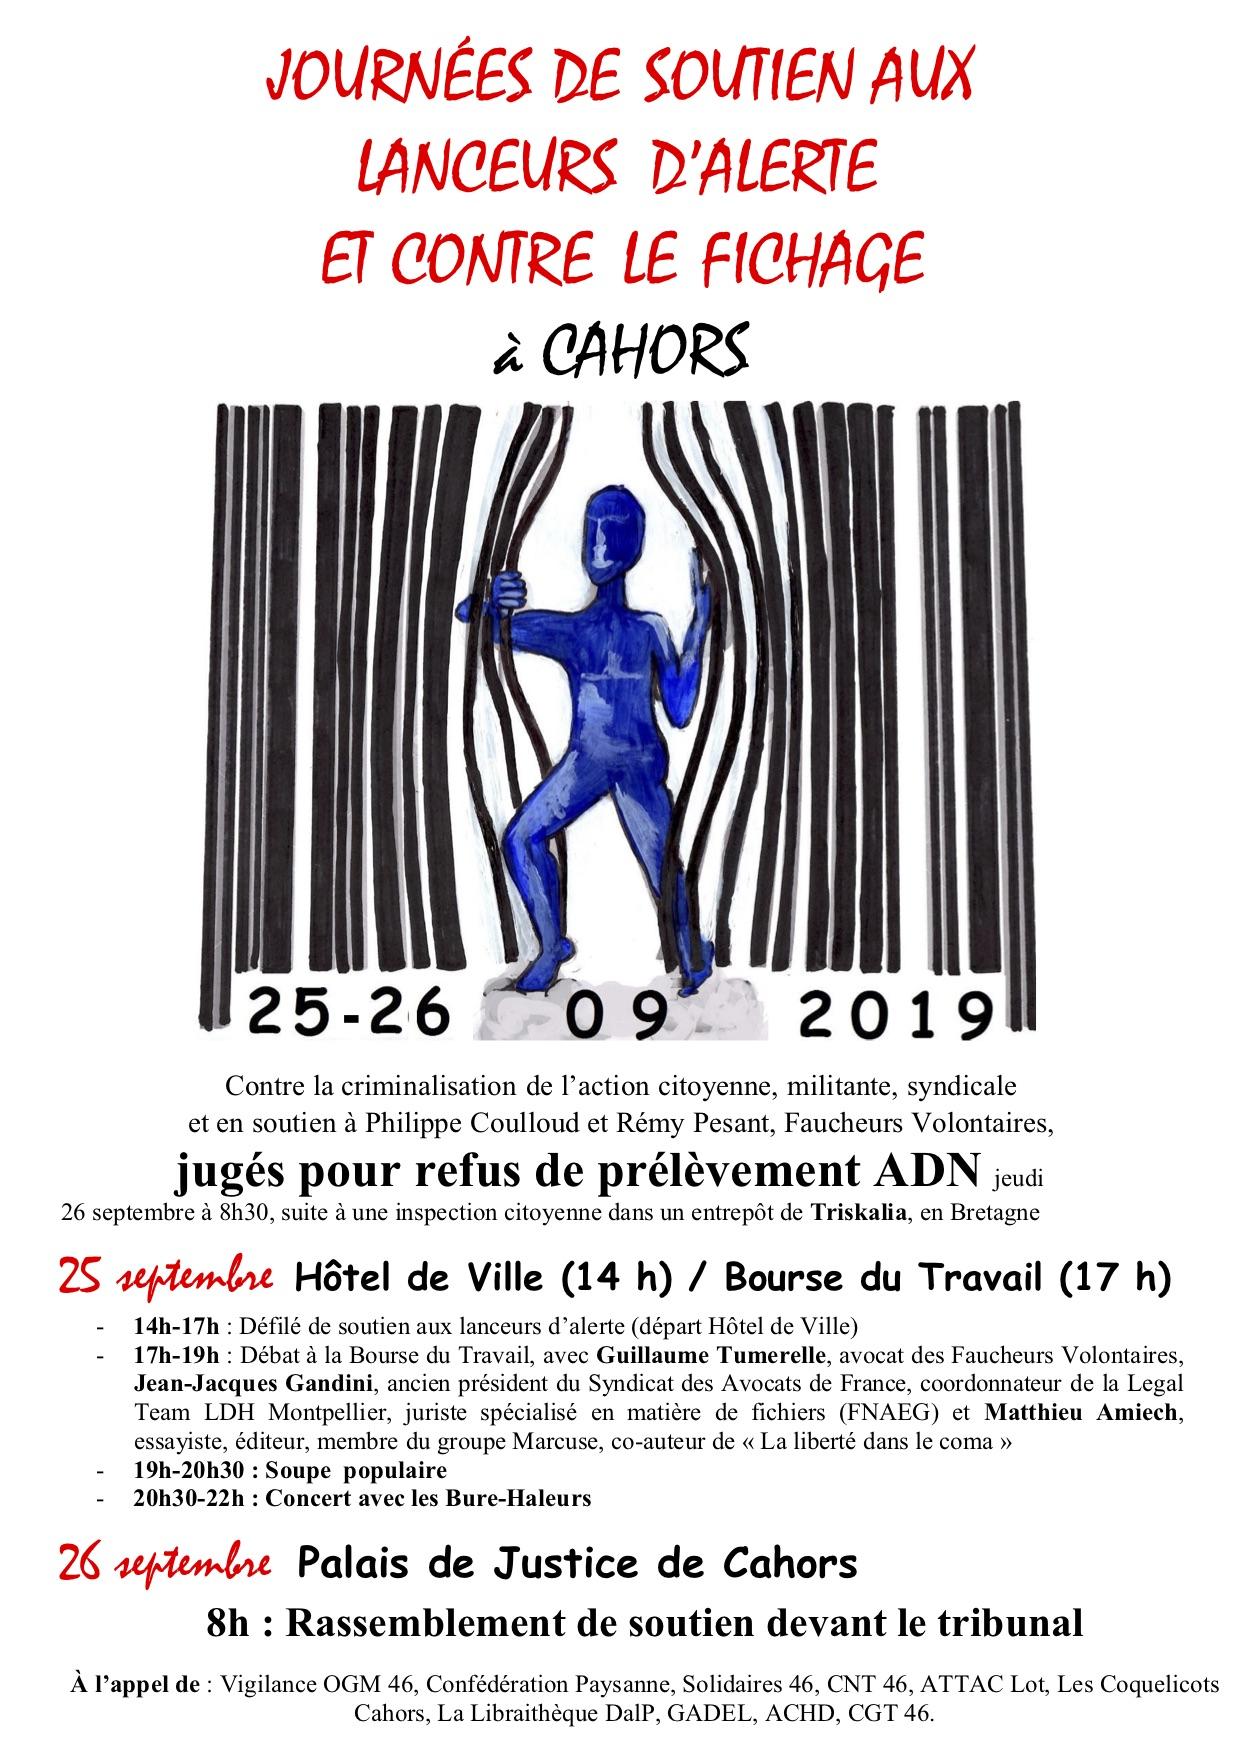 2019.09.25-26 Procès Cahors flyer.jpg